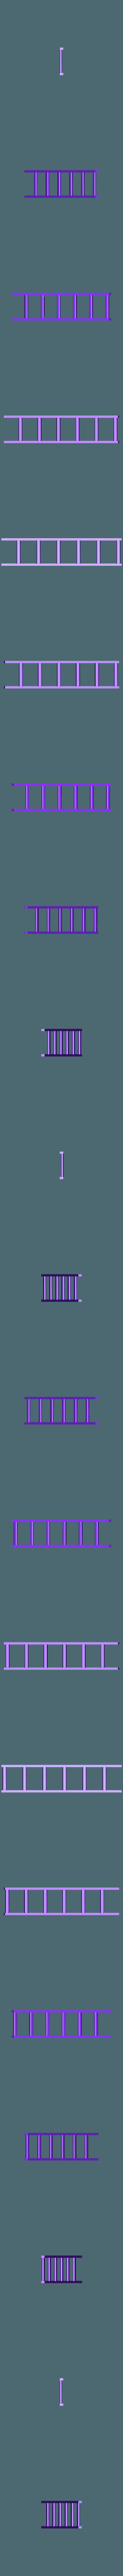 LPT3K_ladder.stl Download free STL file Ladder Peg Toy 3000: Codename Overkill • 3D printing object, ecoiras